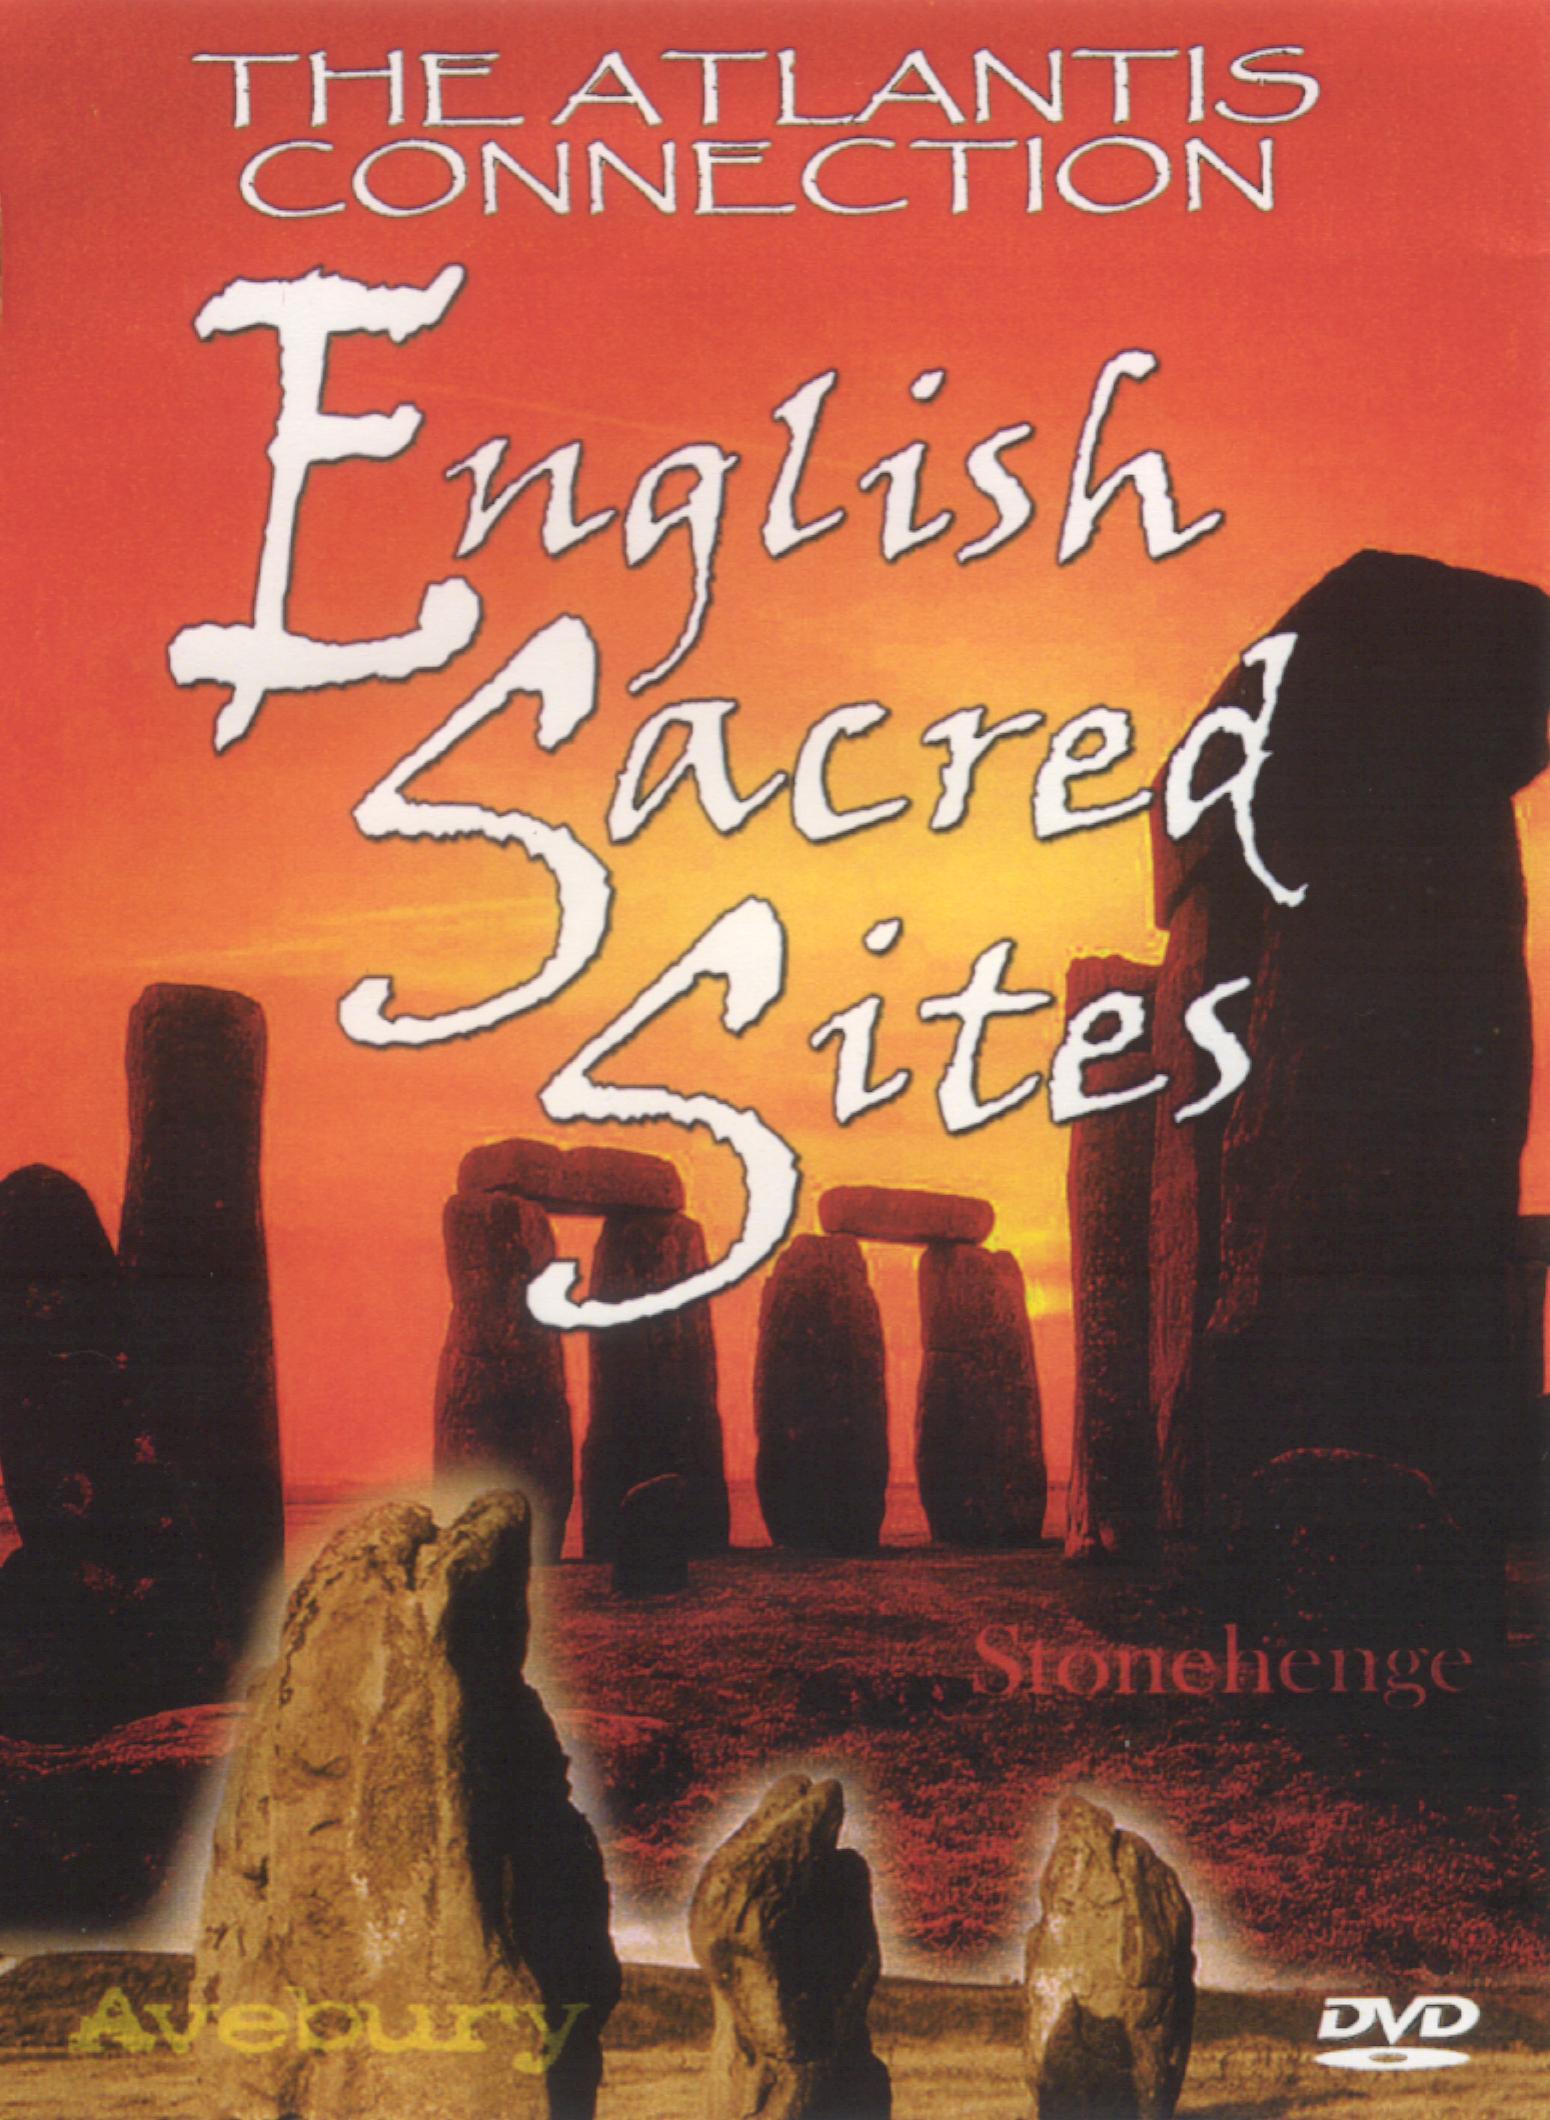 English Sacred Sites: The Atlantis Connection